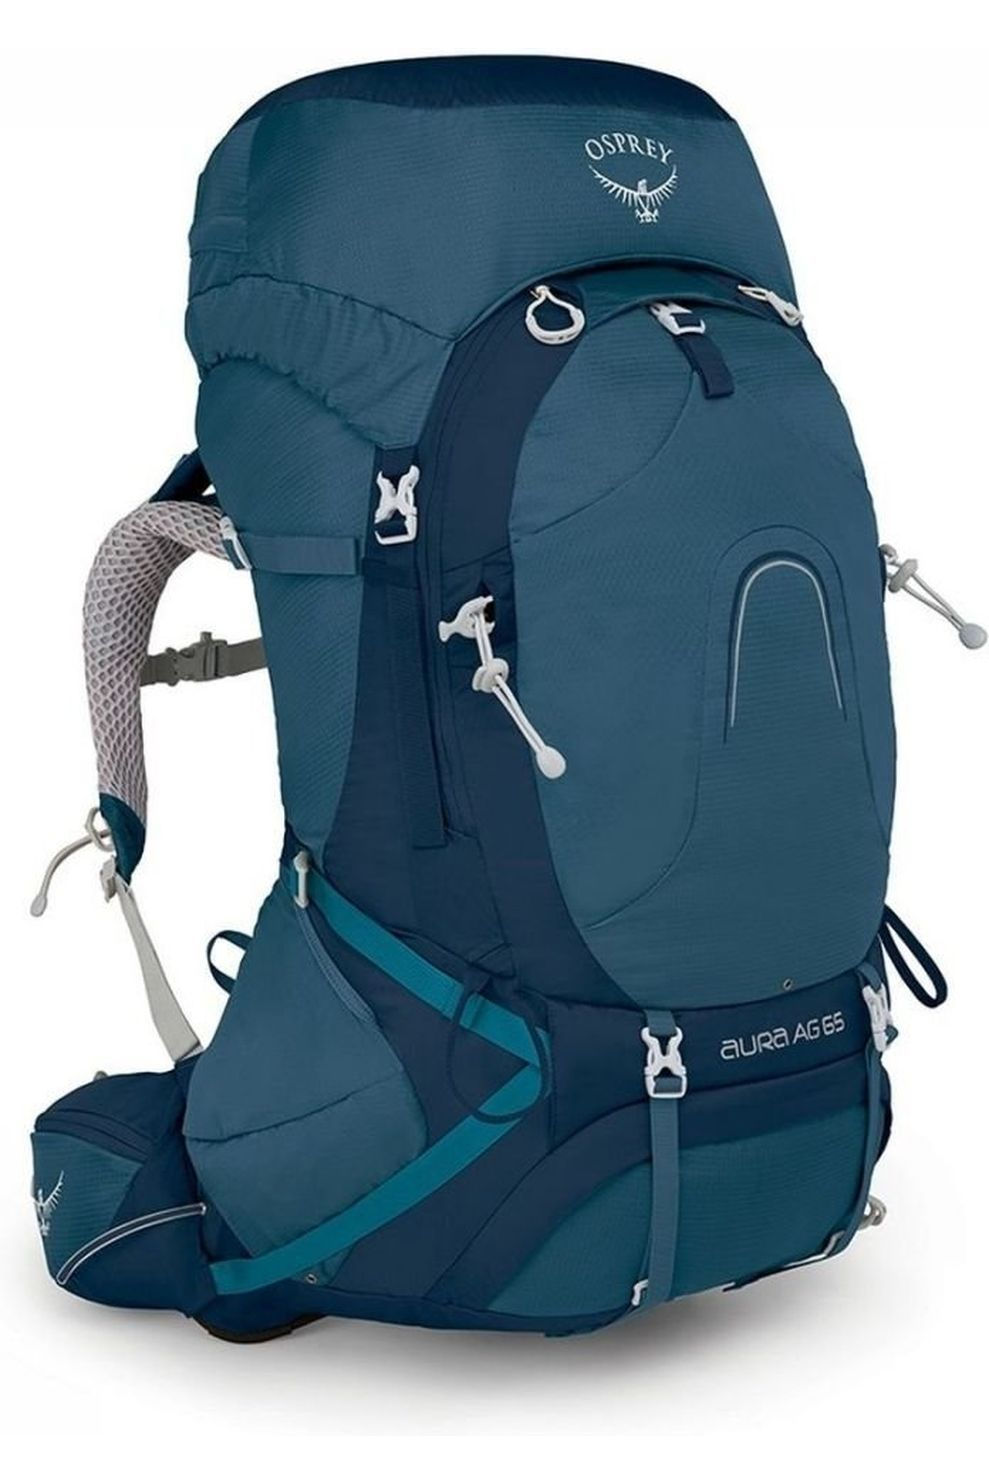 Osprey Rugzak Aura AG 65 voor dames - Blauw - Maten: S, M